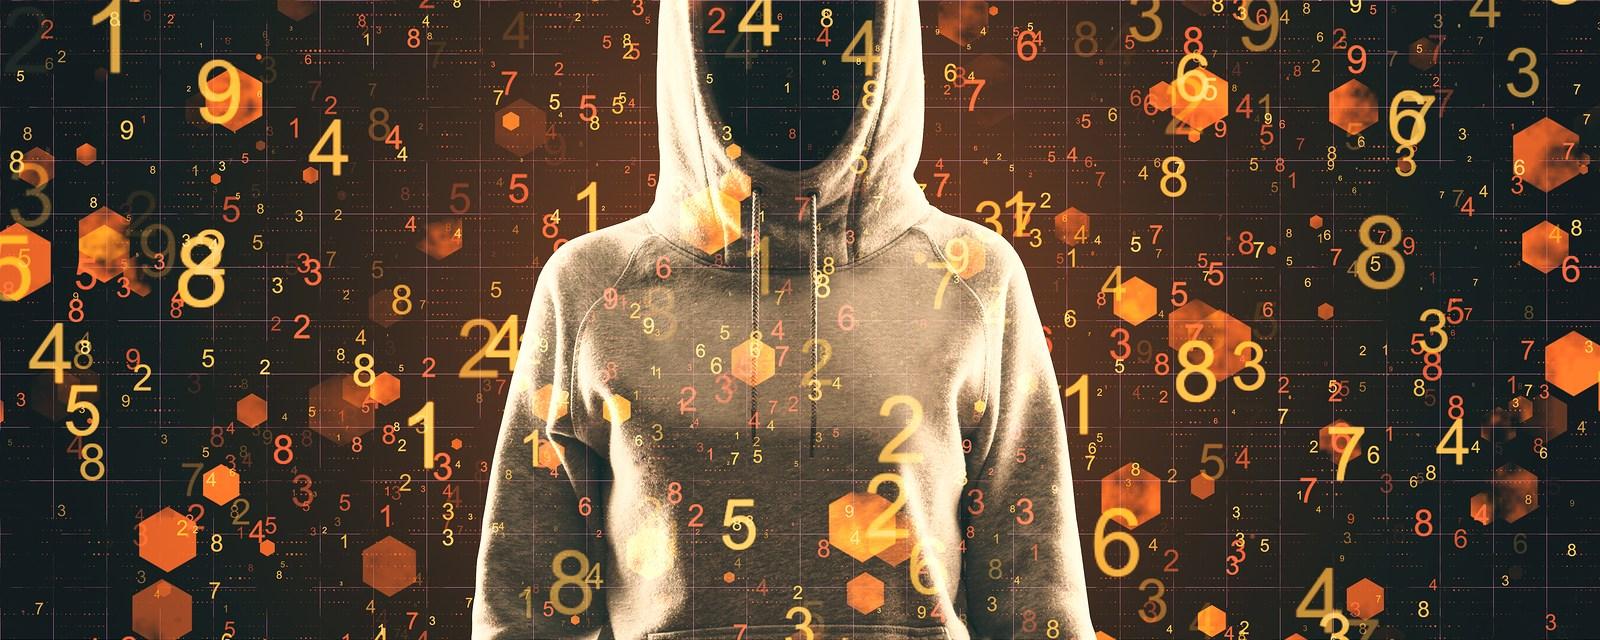 Malware-As-A-Service On The Dark web!